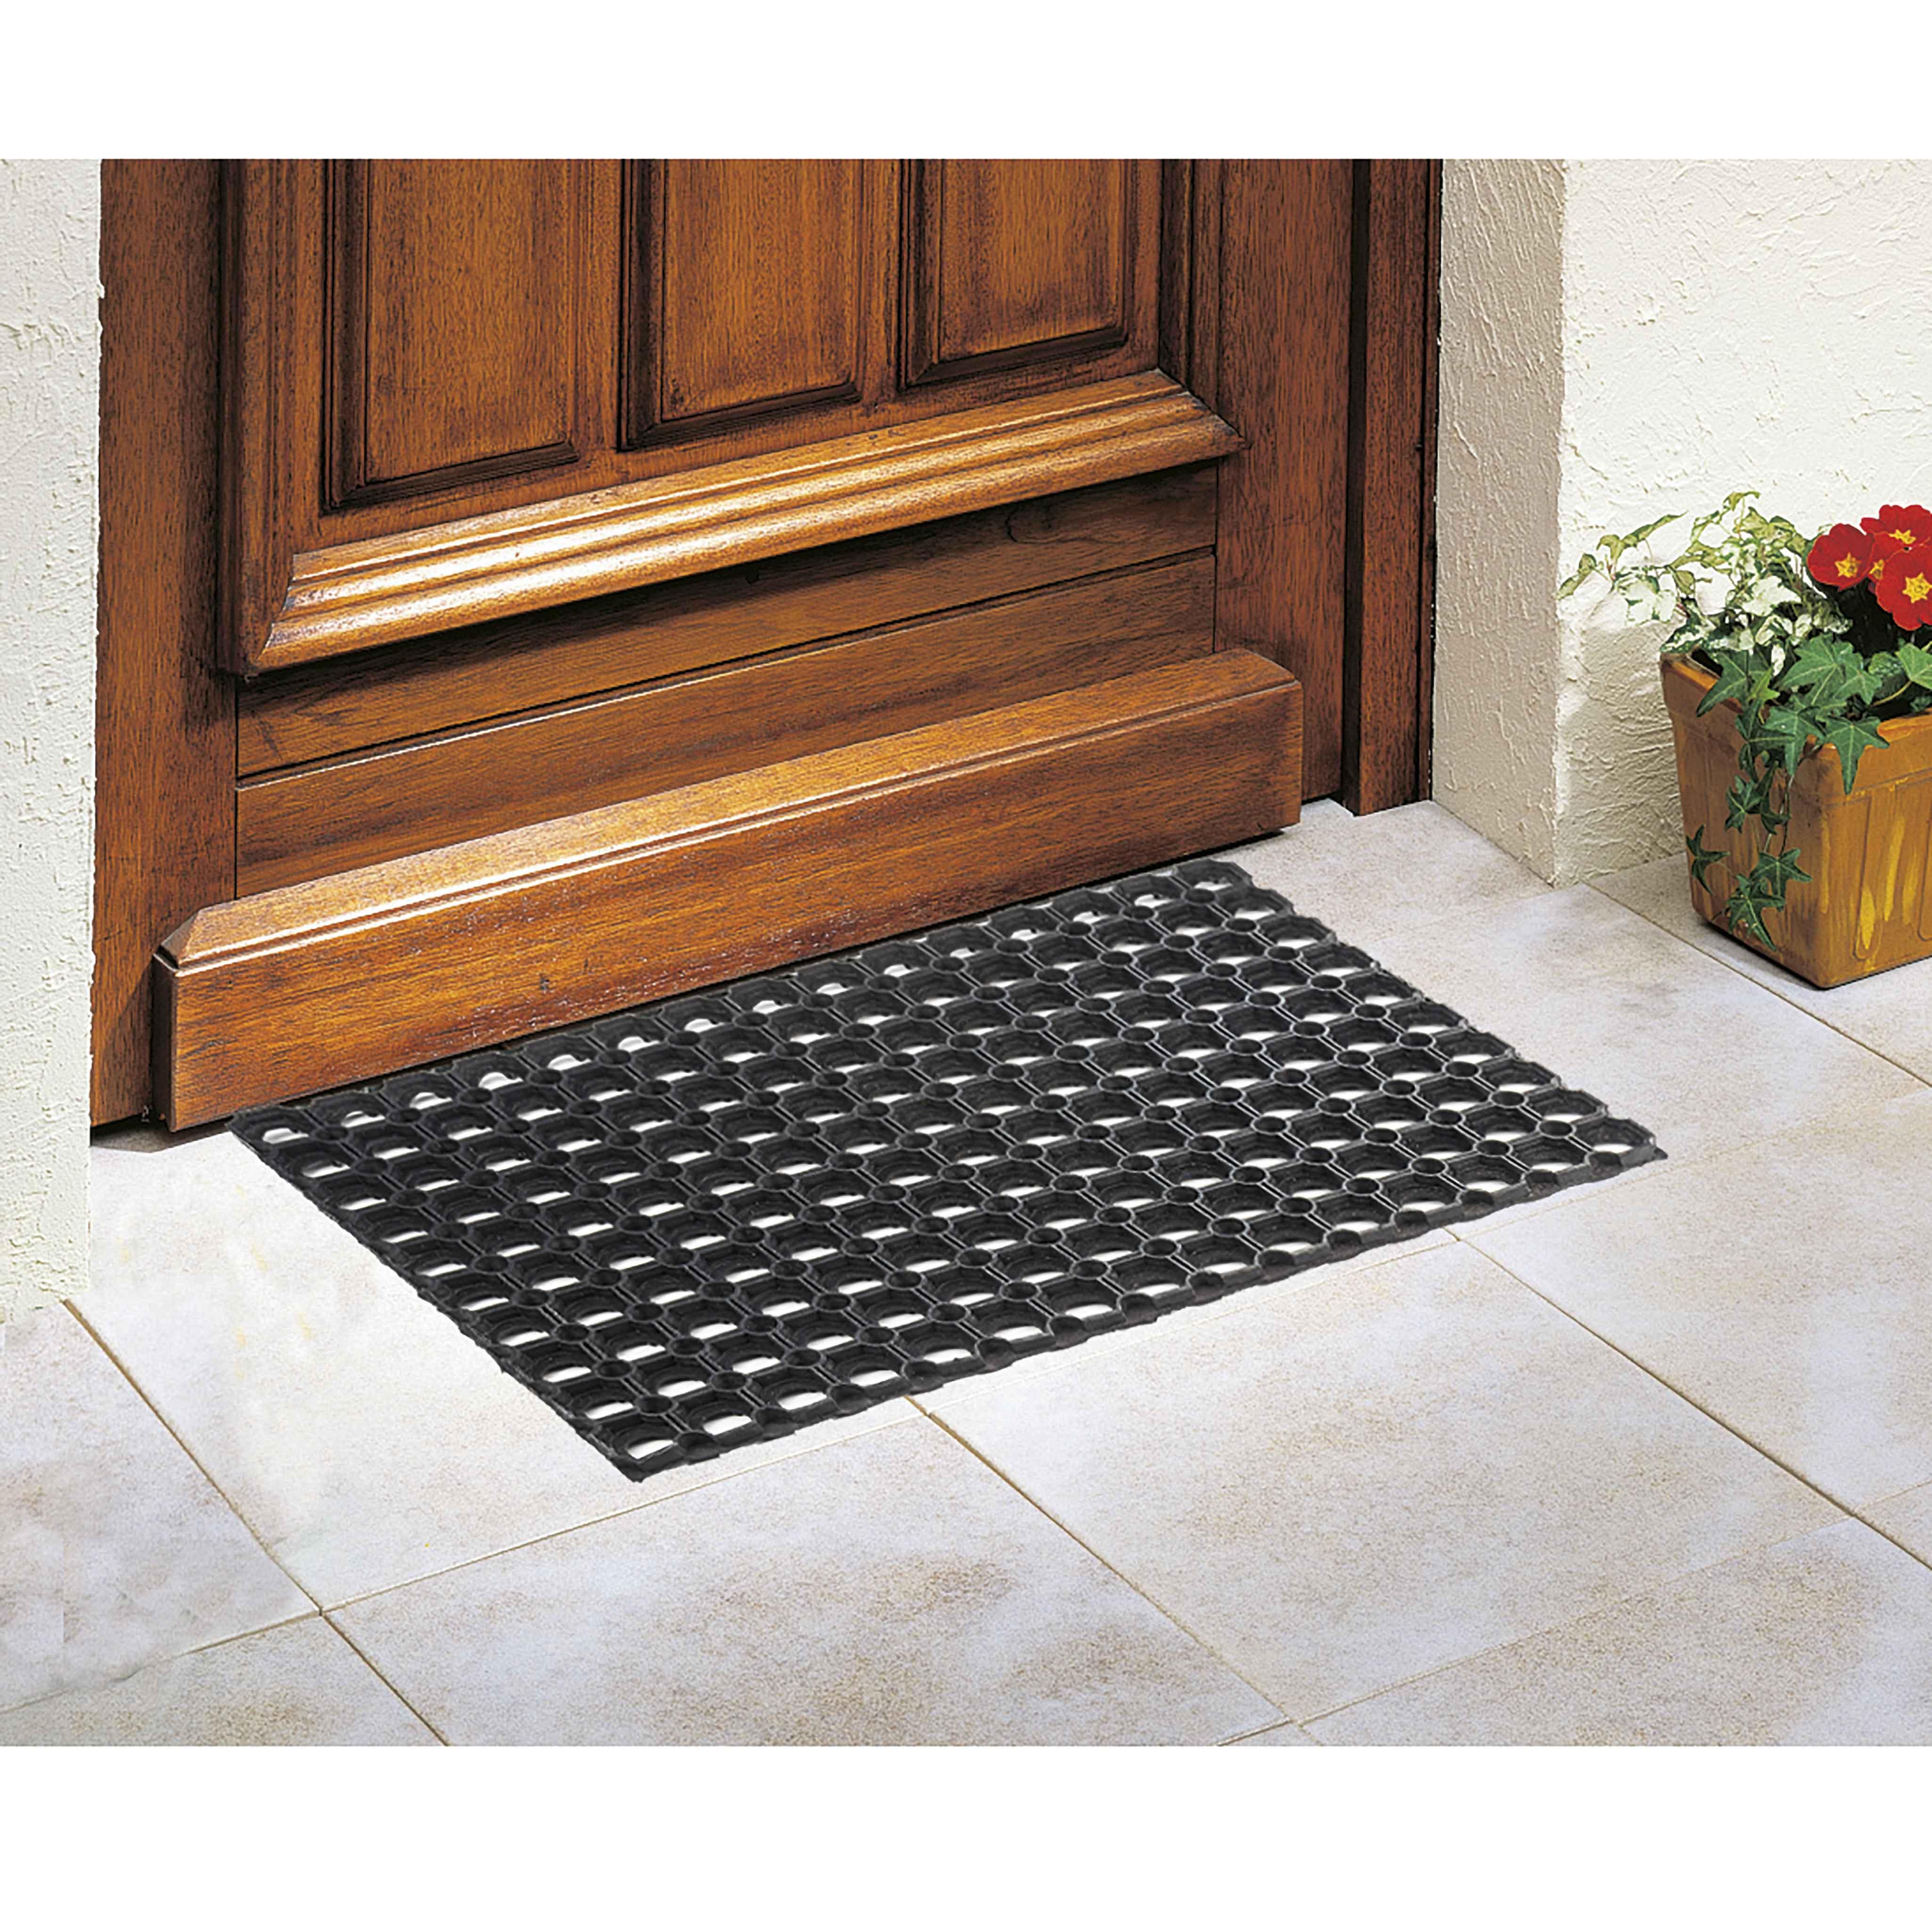 tapis caillebotis 40x60cm 100 caoutchouc distriartisan. Black Bedroom Furniture Sets. Home Design Ideas